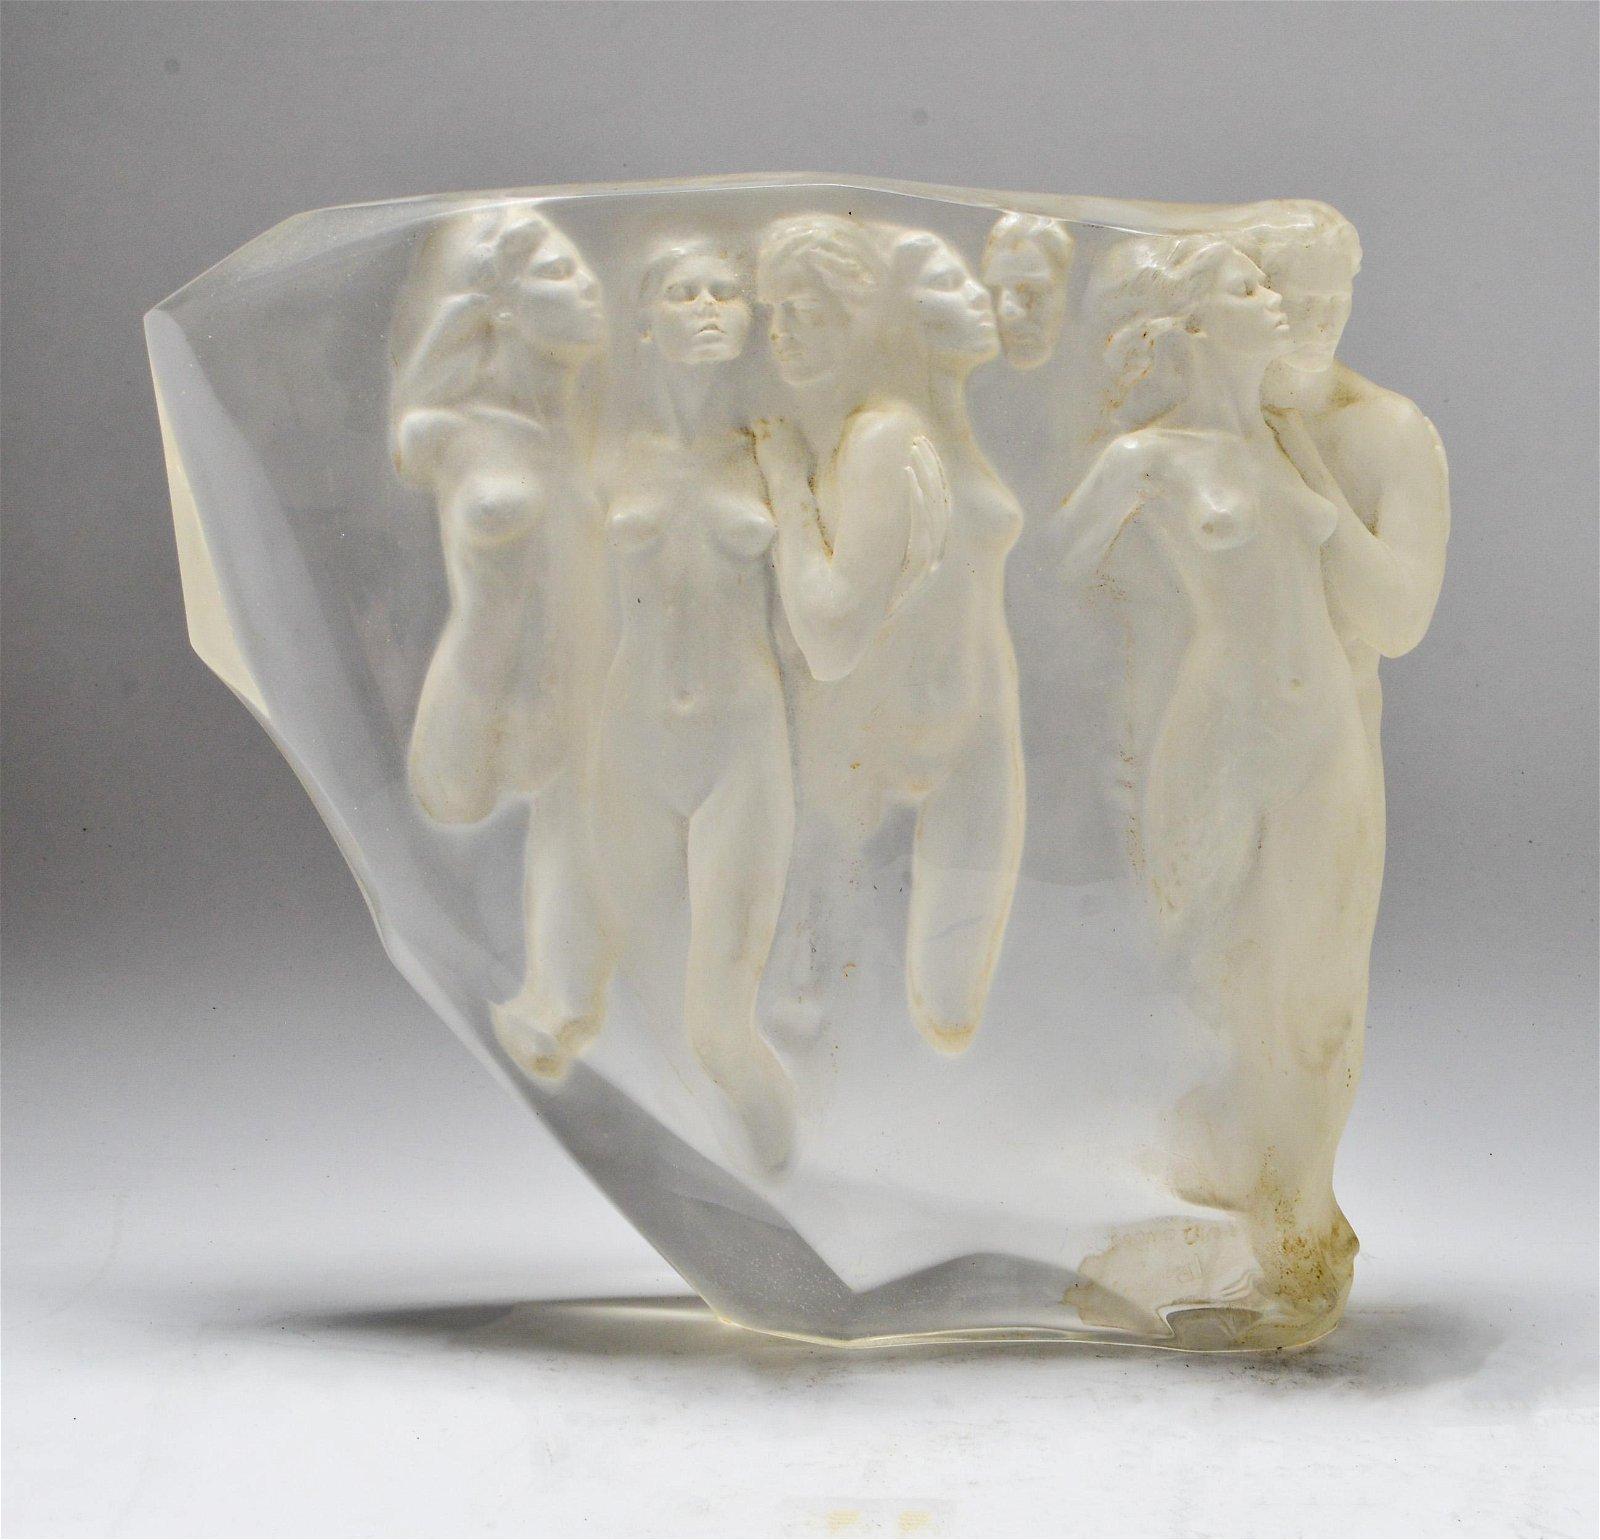 Frederick Hart Manner Resin Sculpture